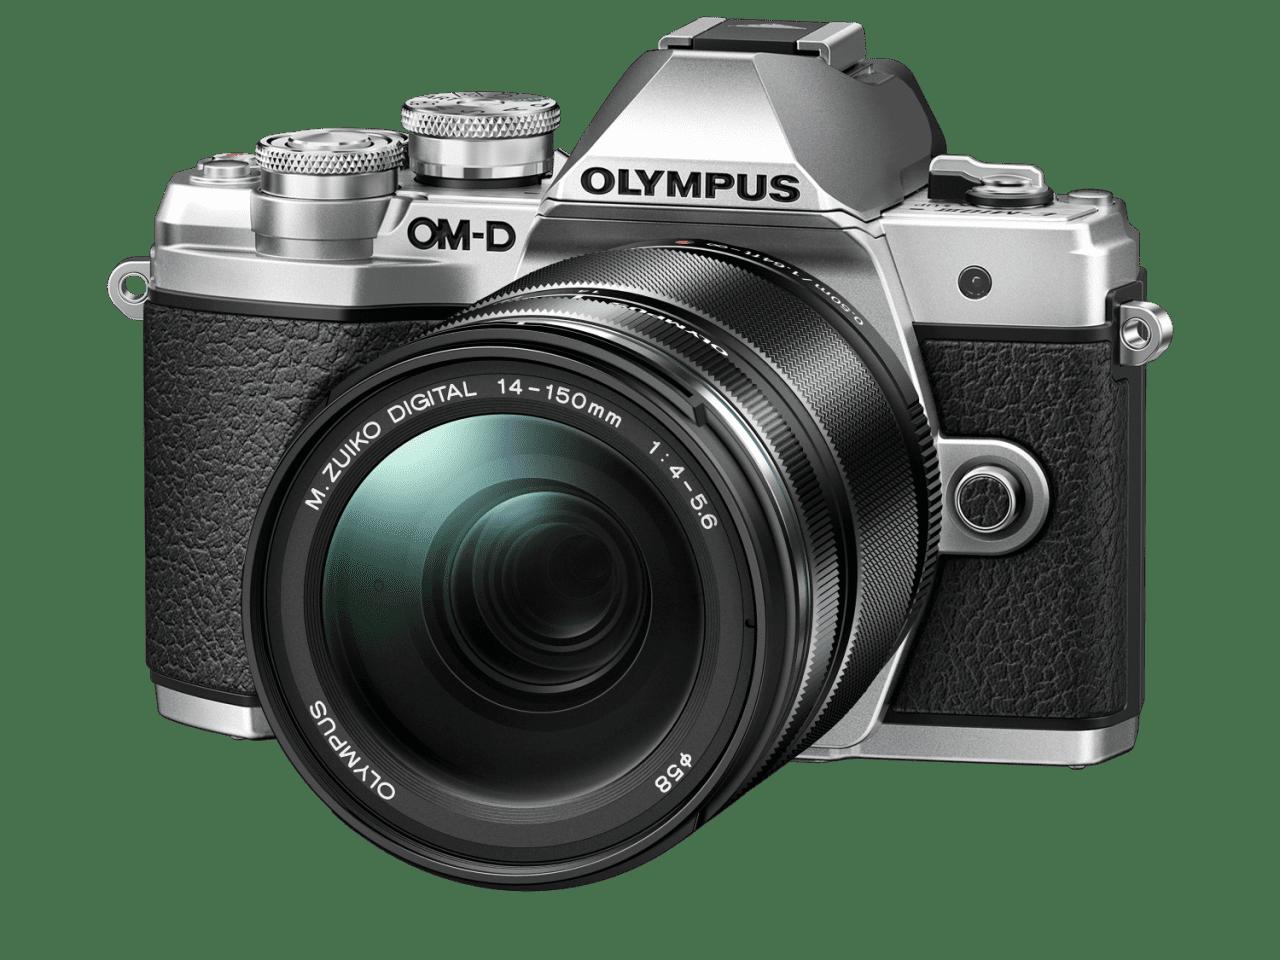 Olympus E-M10 Mark III Silver + 14-150mm kit Black - Olympus 9.01.03.03.122